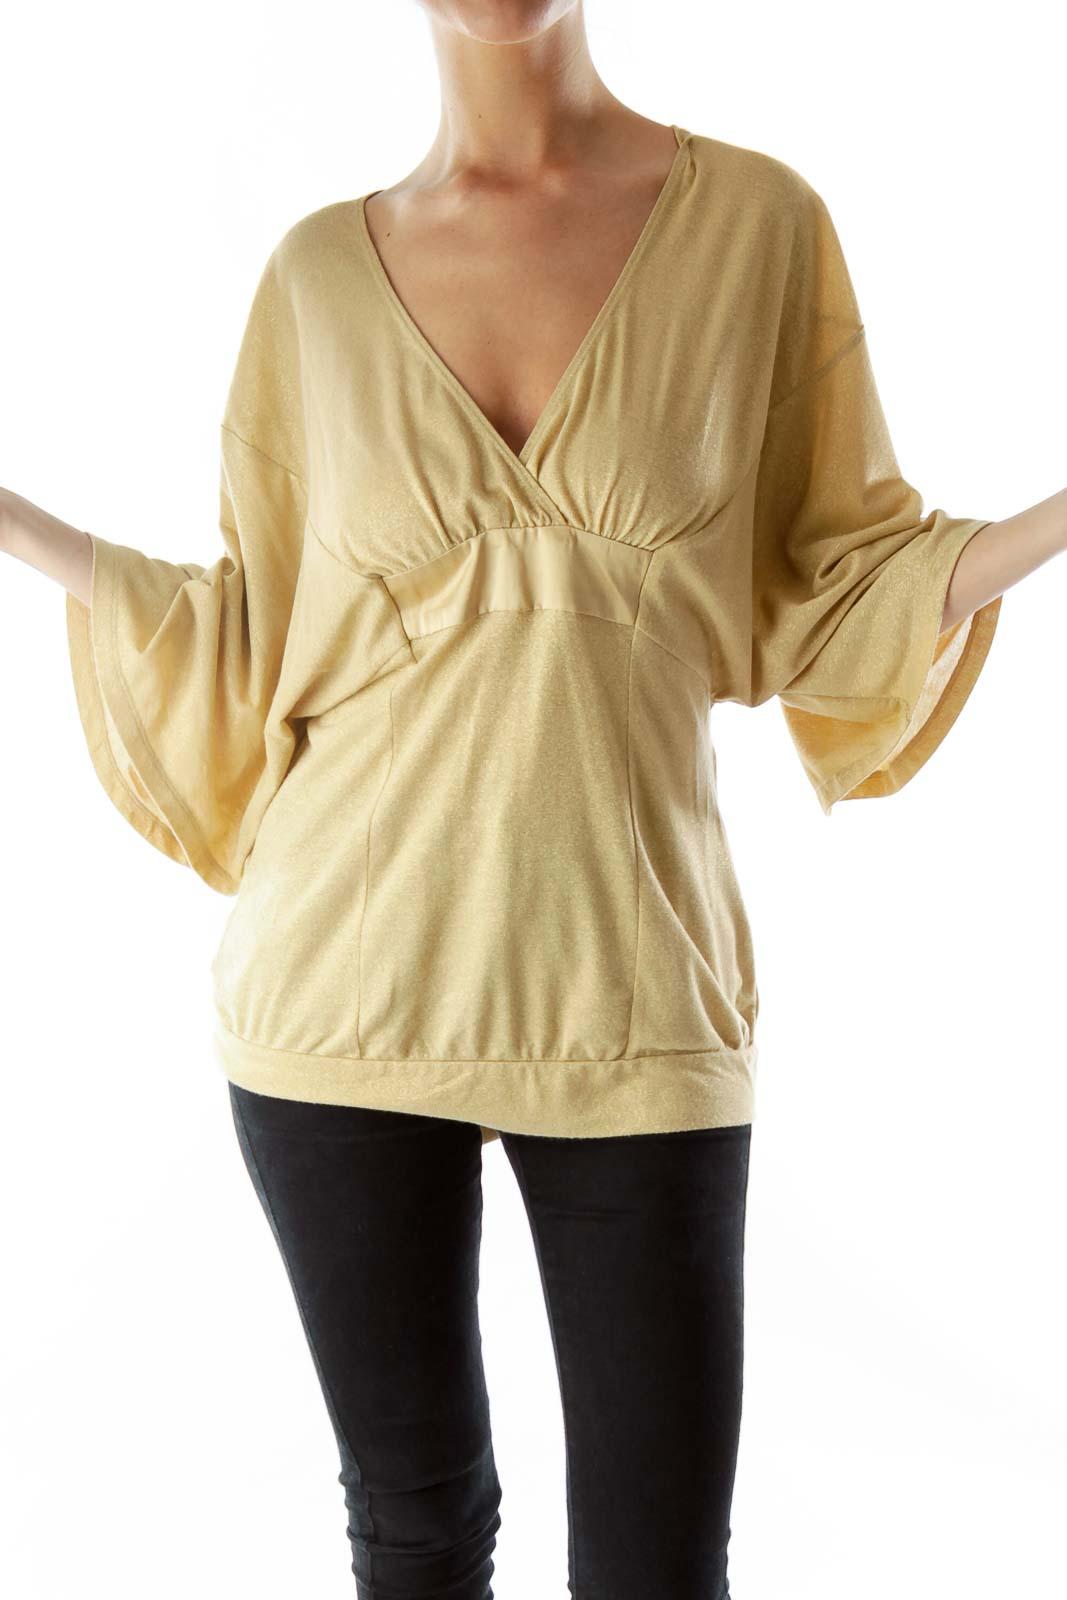 Gold Metallic Knit Top with Sash